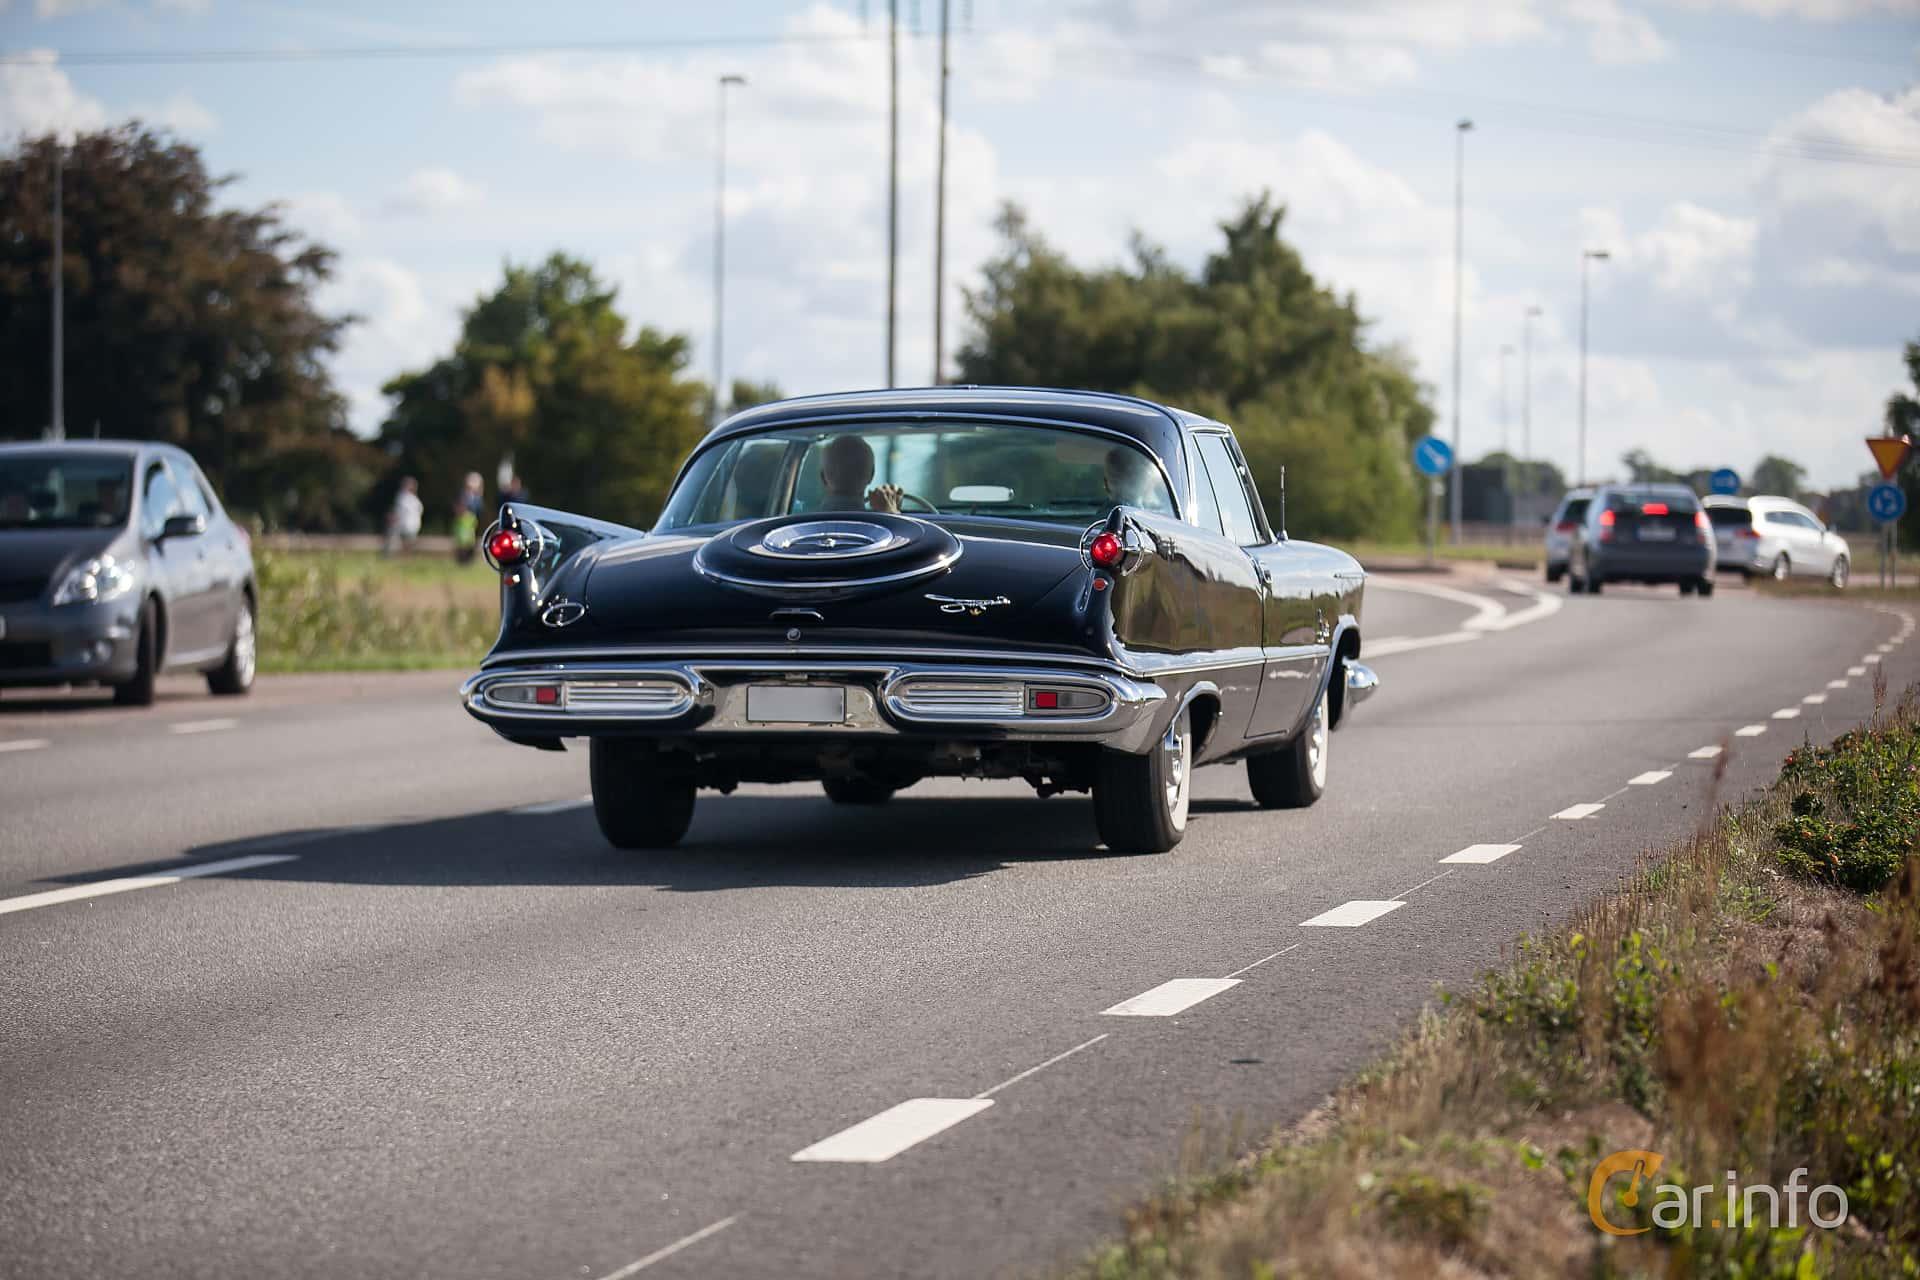 Imperial Crown 2-door Southampton 6.4 V8 TorqueFlite, 349hp, 1958 at Lergökarallyt 2018